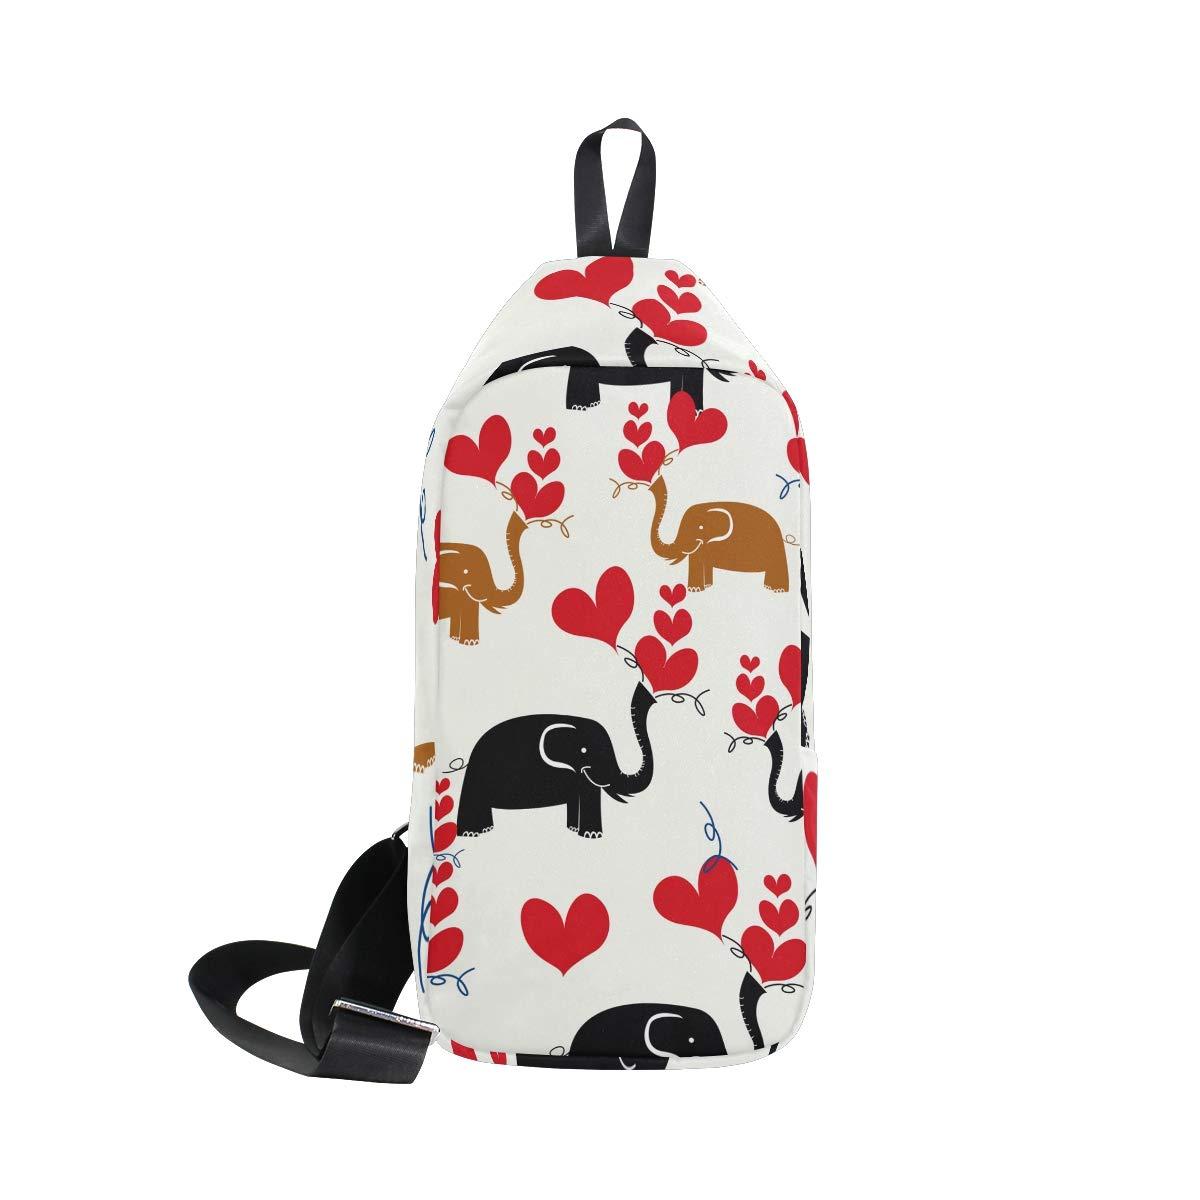 TFONE Cute Elephant Heart Pattern Crossbody Bag Lightweight Chest Shoulder Messenger Pack Backpack Sling Bag